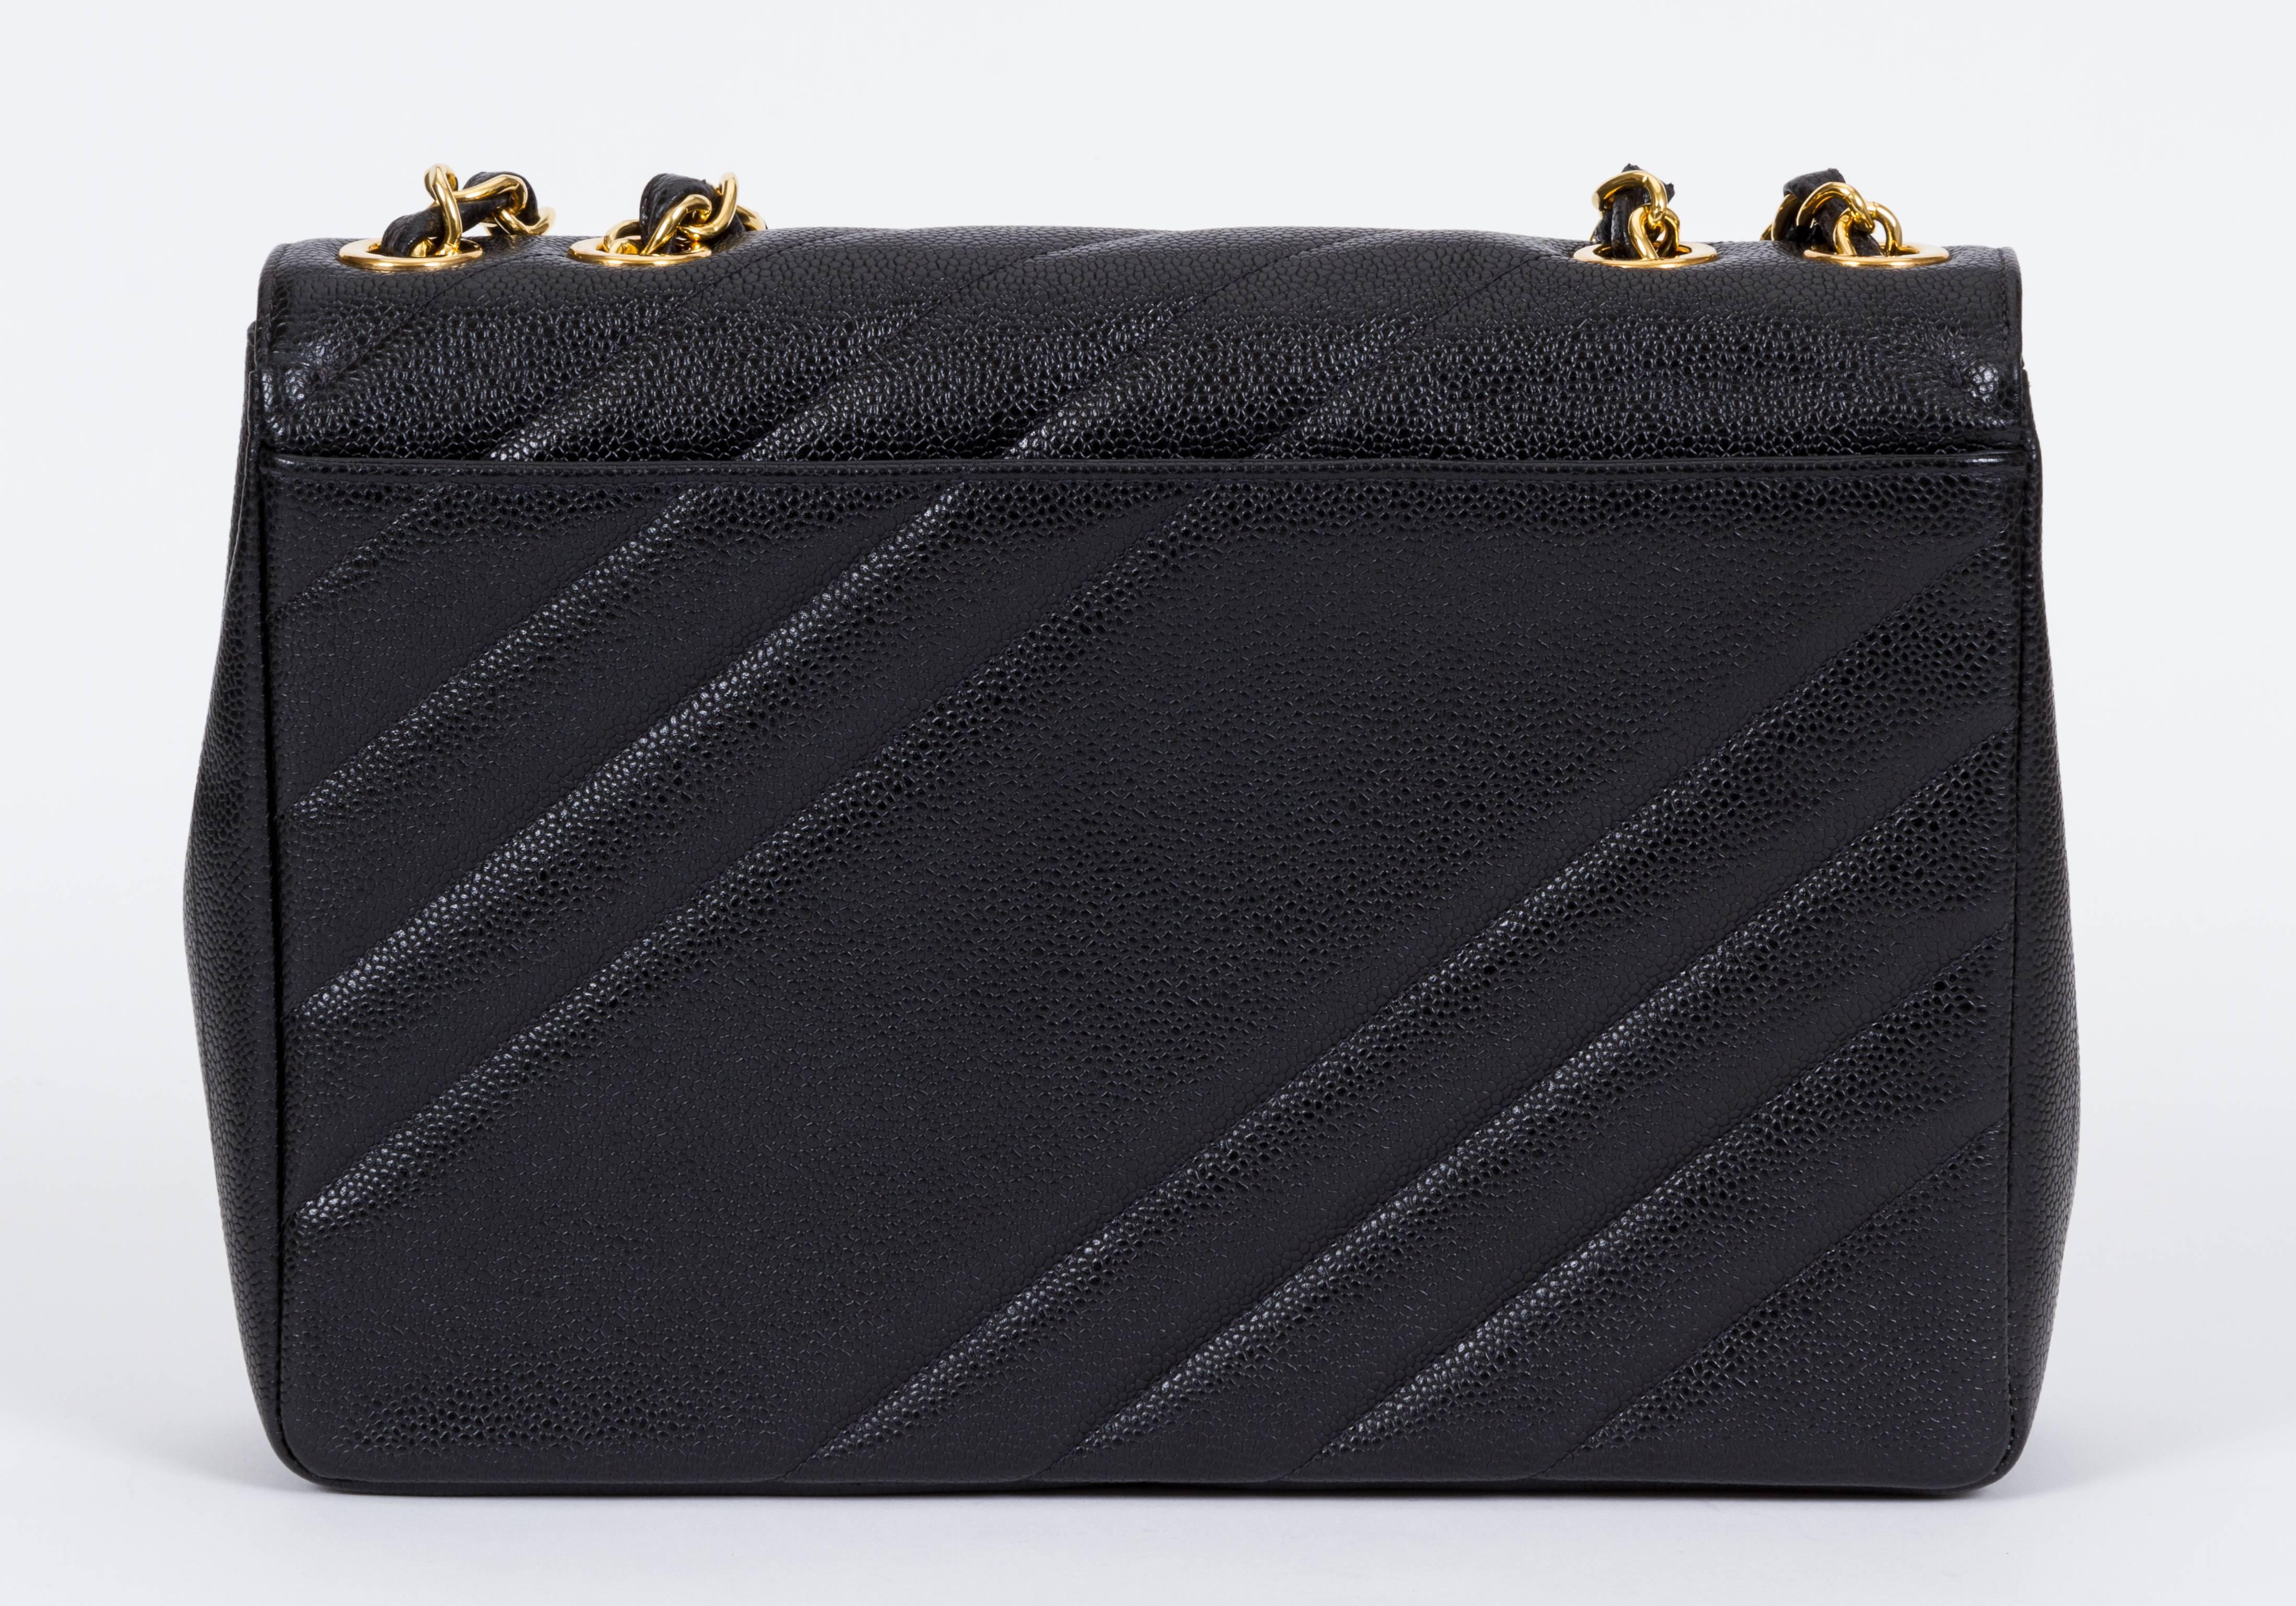 29dc10beec0d Chanel Black Caviar Diagonal Jumbo Bag at 1stdibs